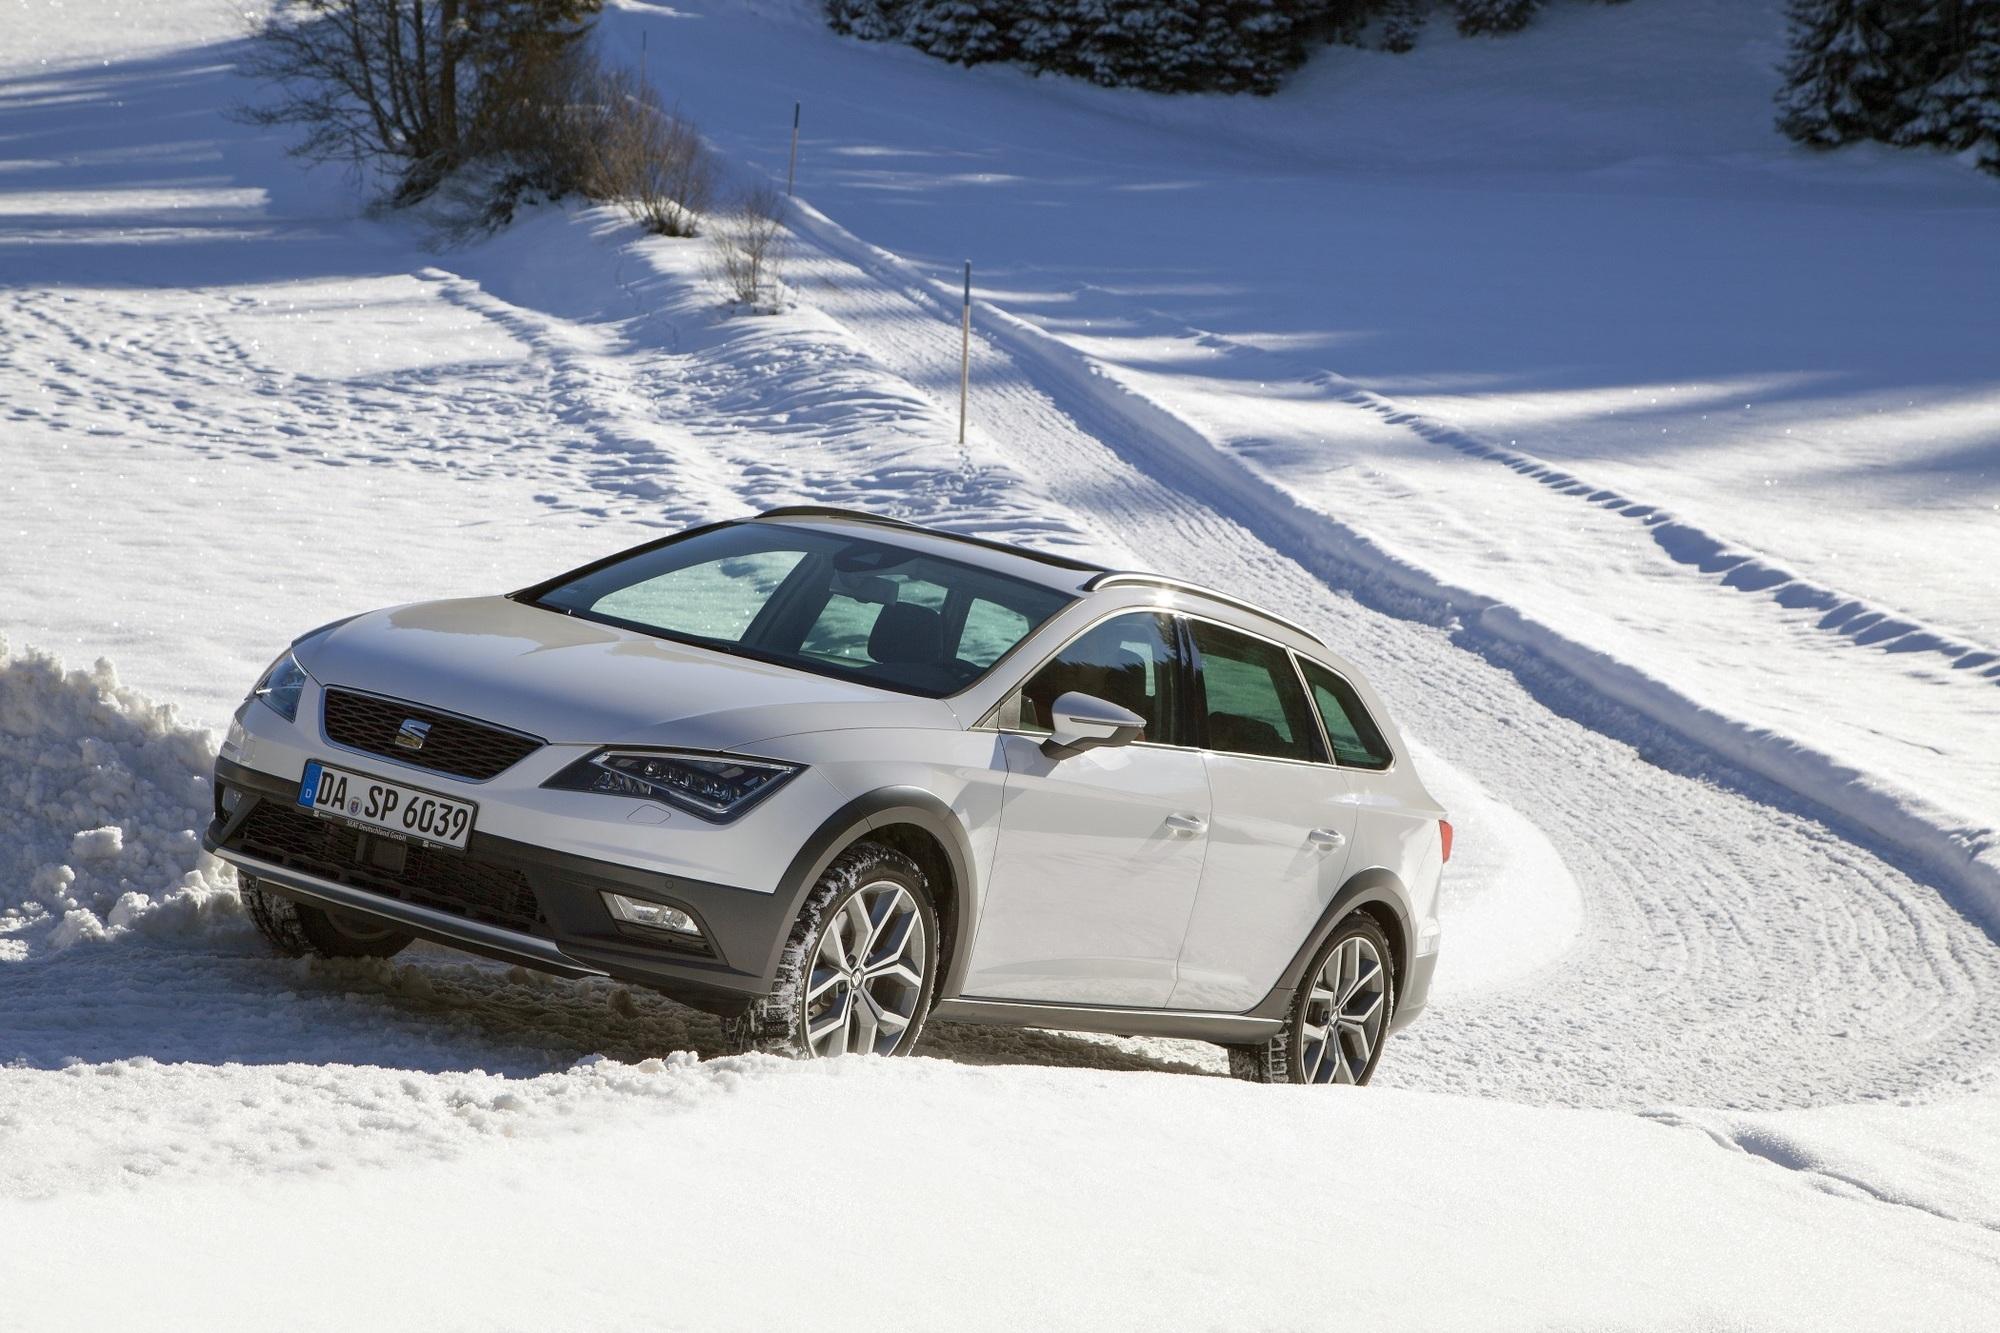 Fahrbericht: Seat Leon ST X-Perience - Schnee Olé